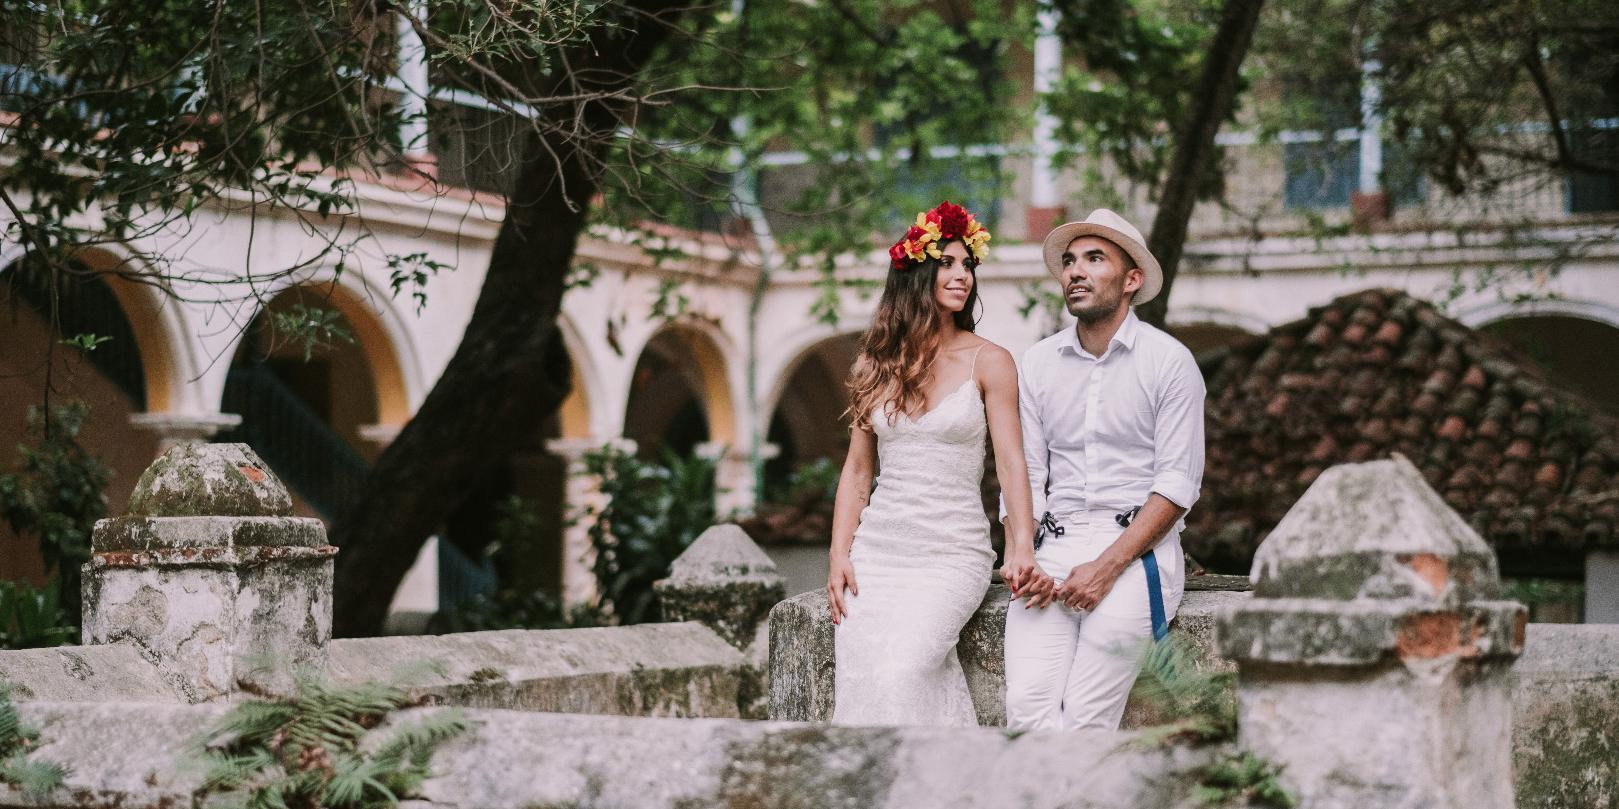 bodas-sin-clasificar-sin-tema-cuba-29011.jpg